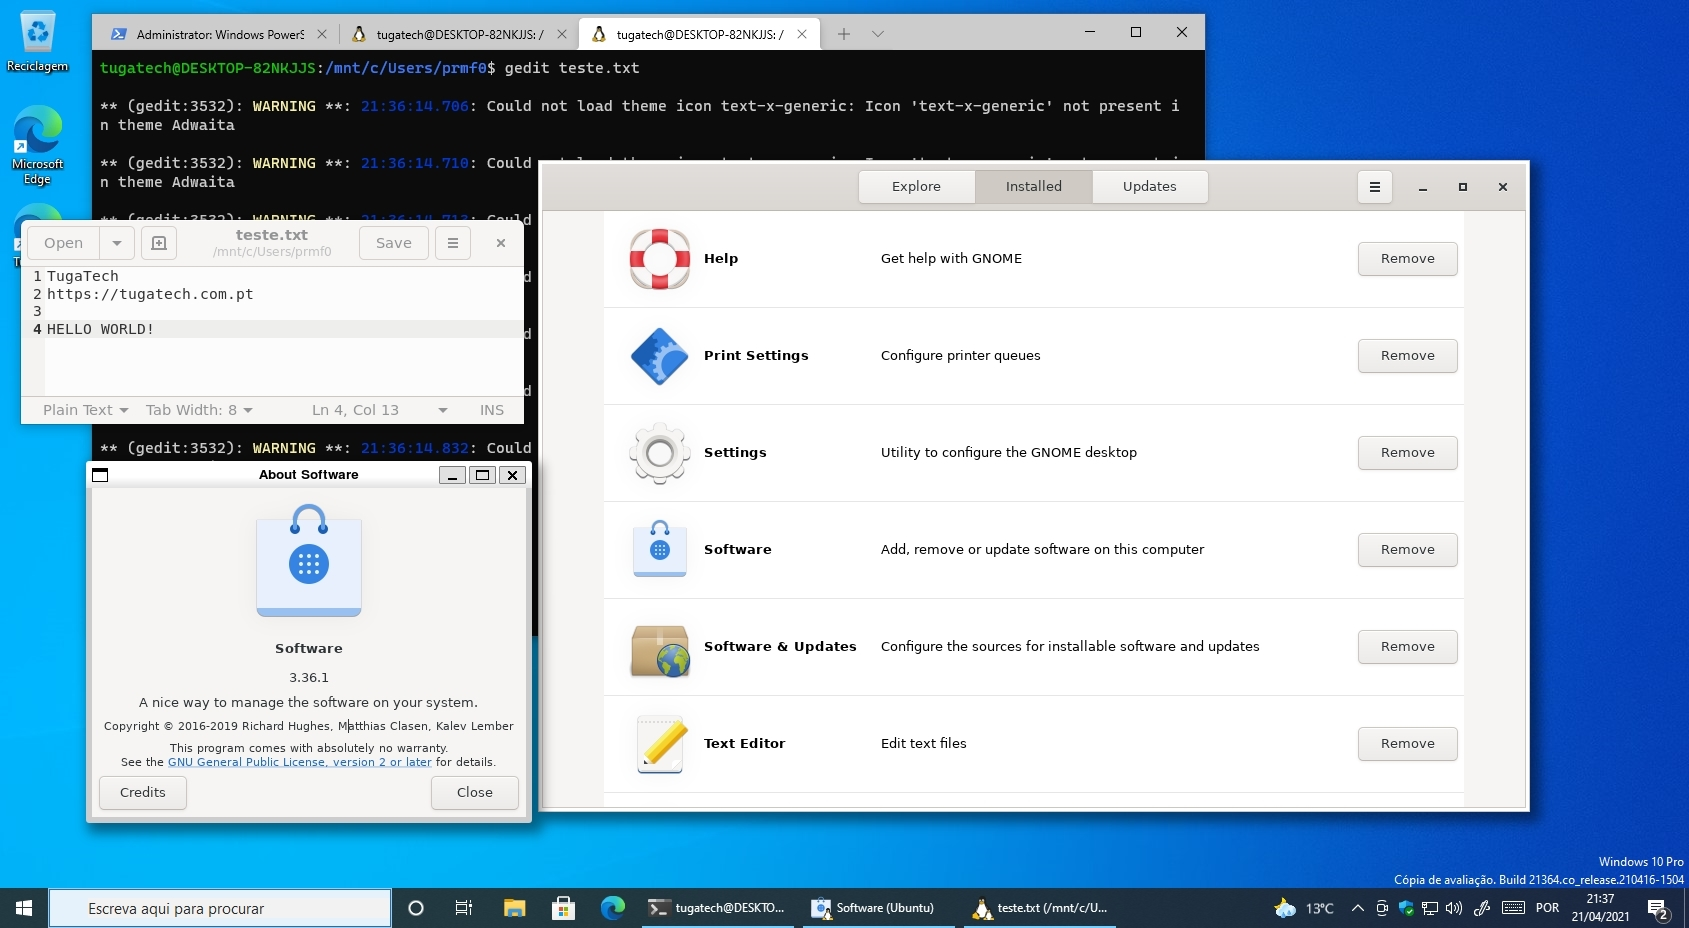 subsistema linux no Windows